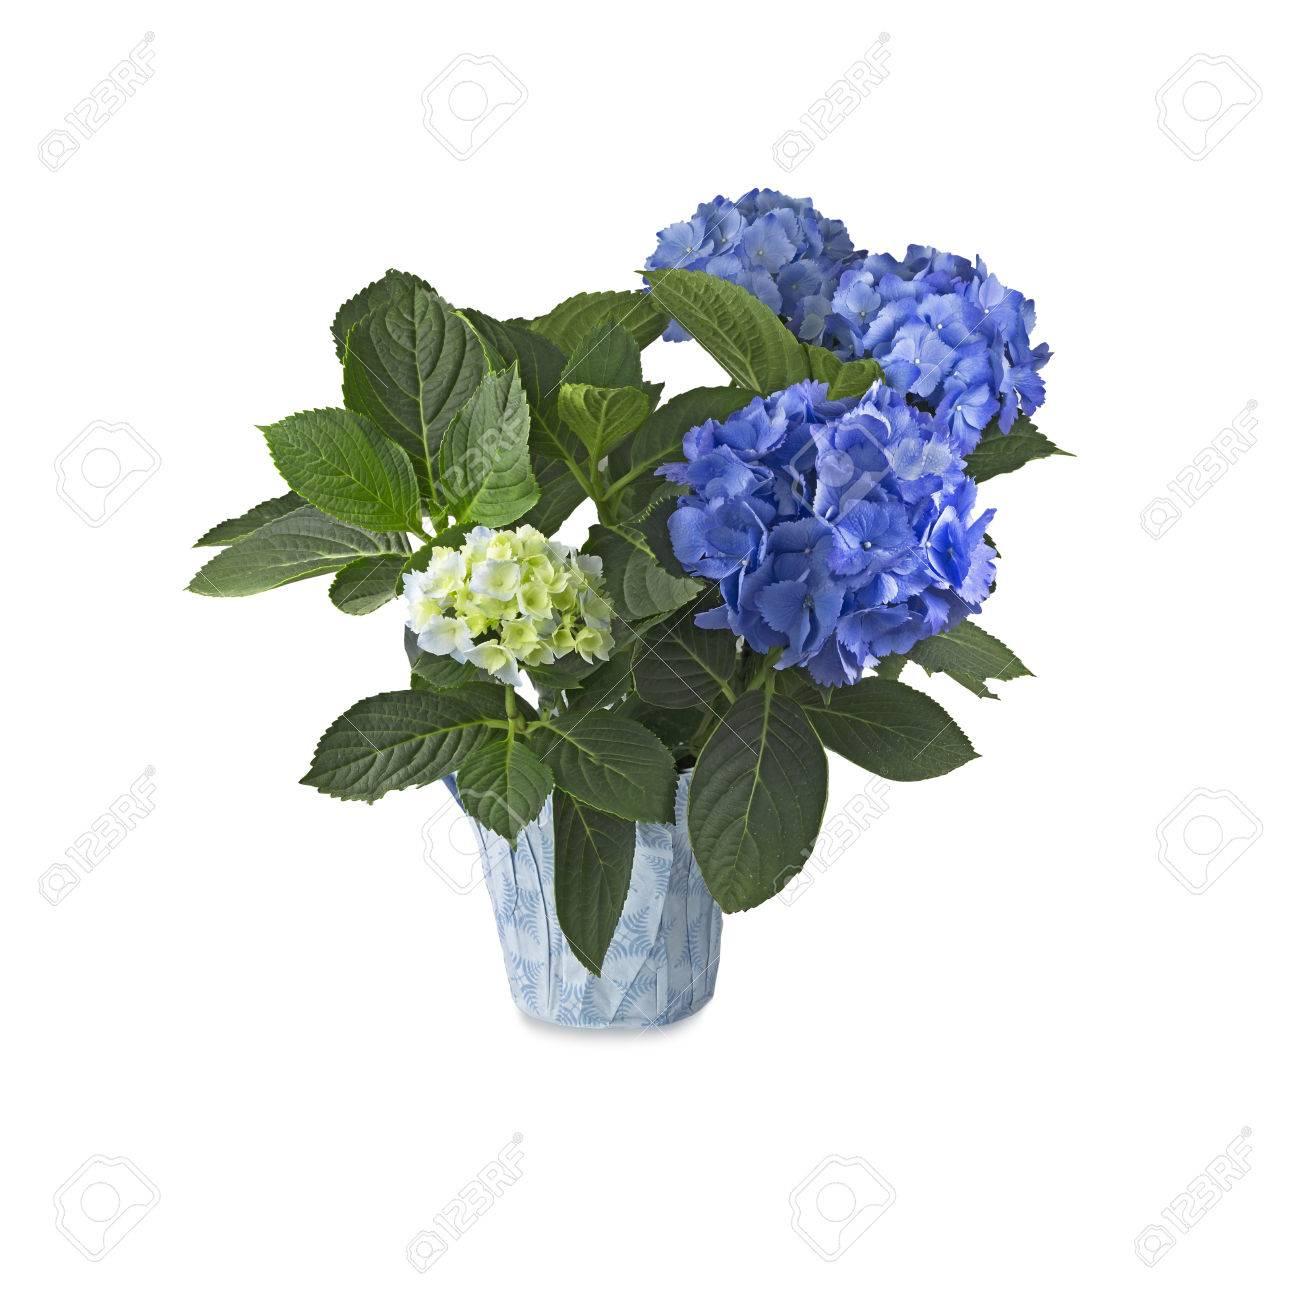 Blue Hortensia (Hydrangea) In Pot On White Background Stock Photo ...